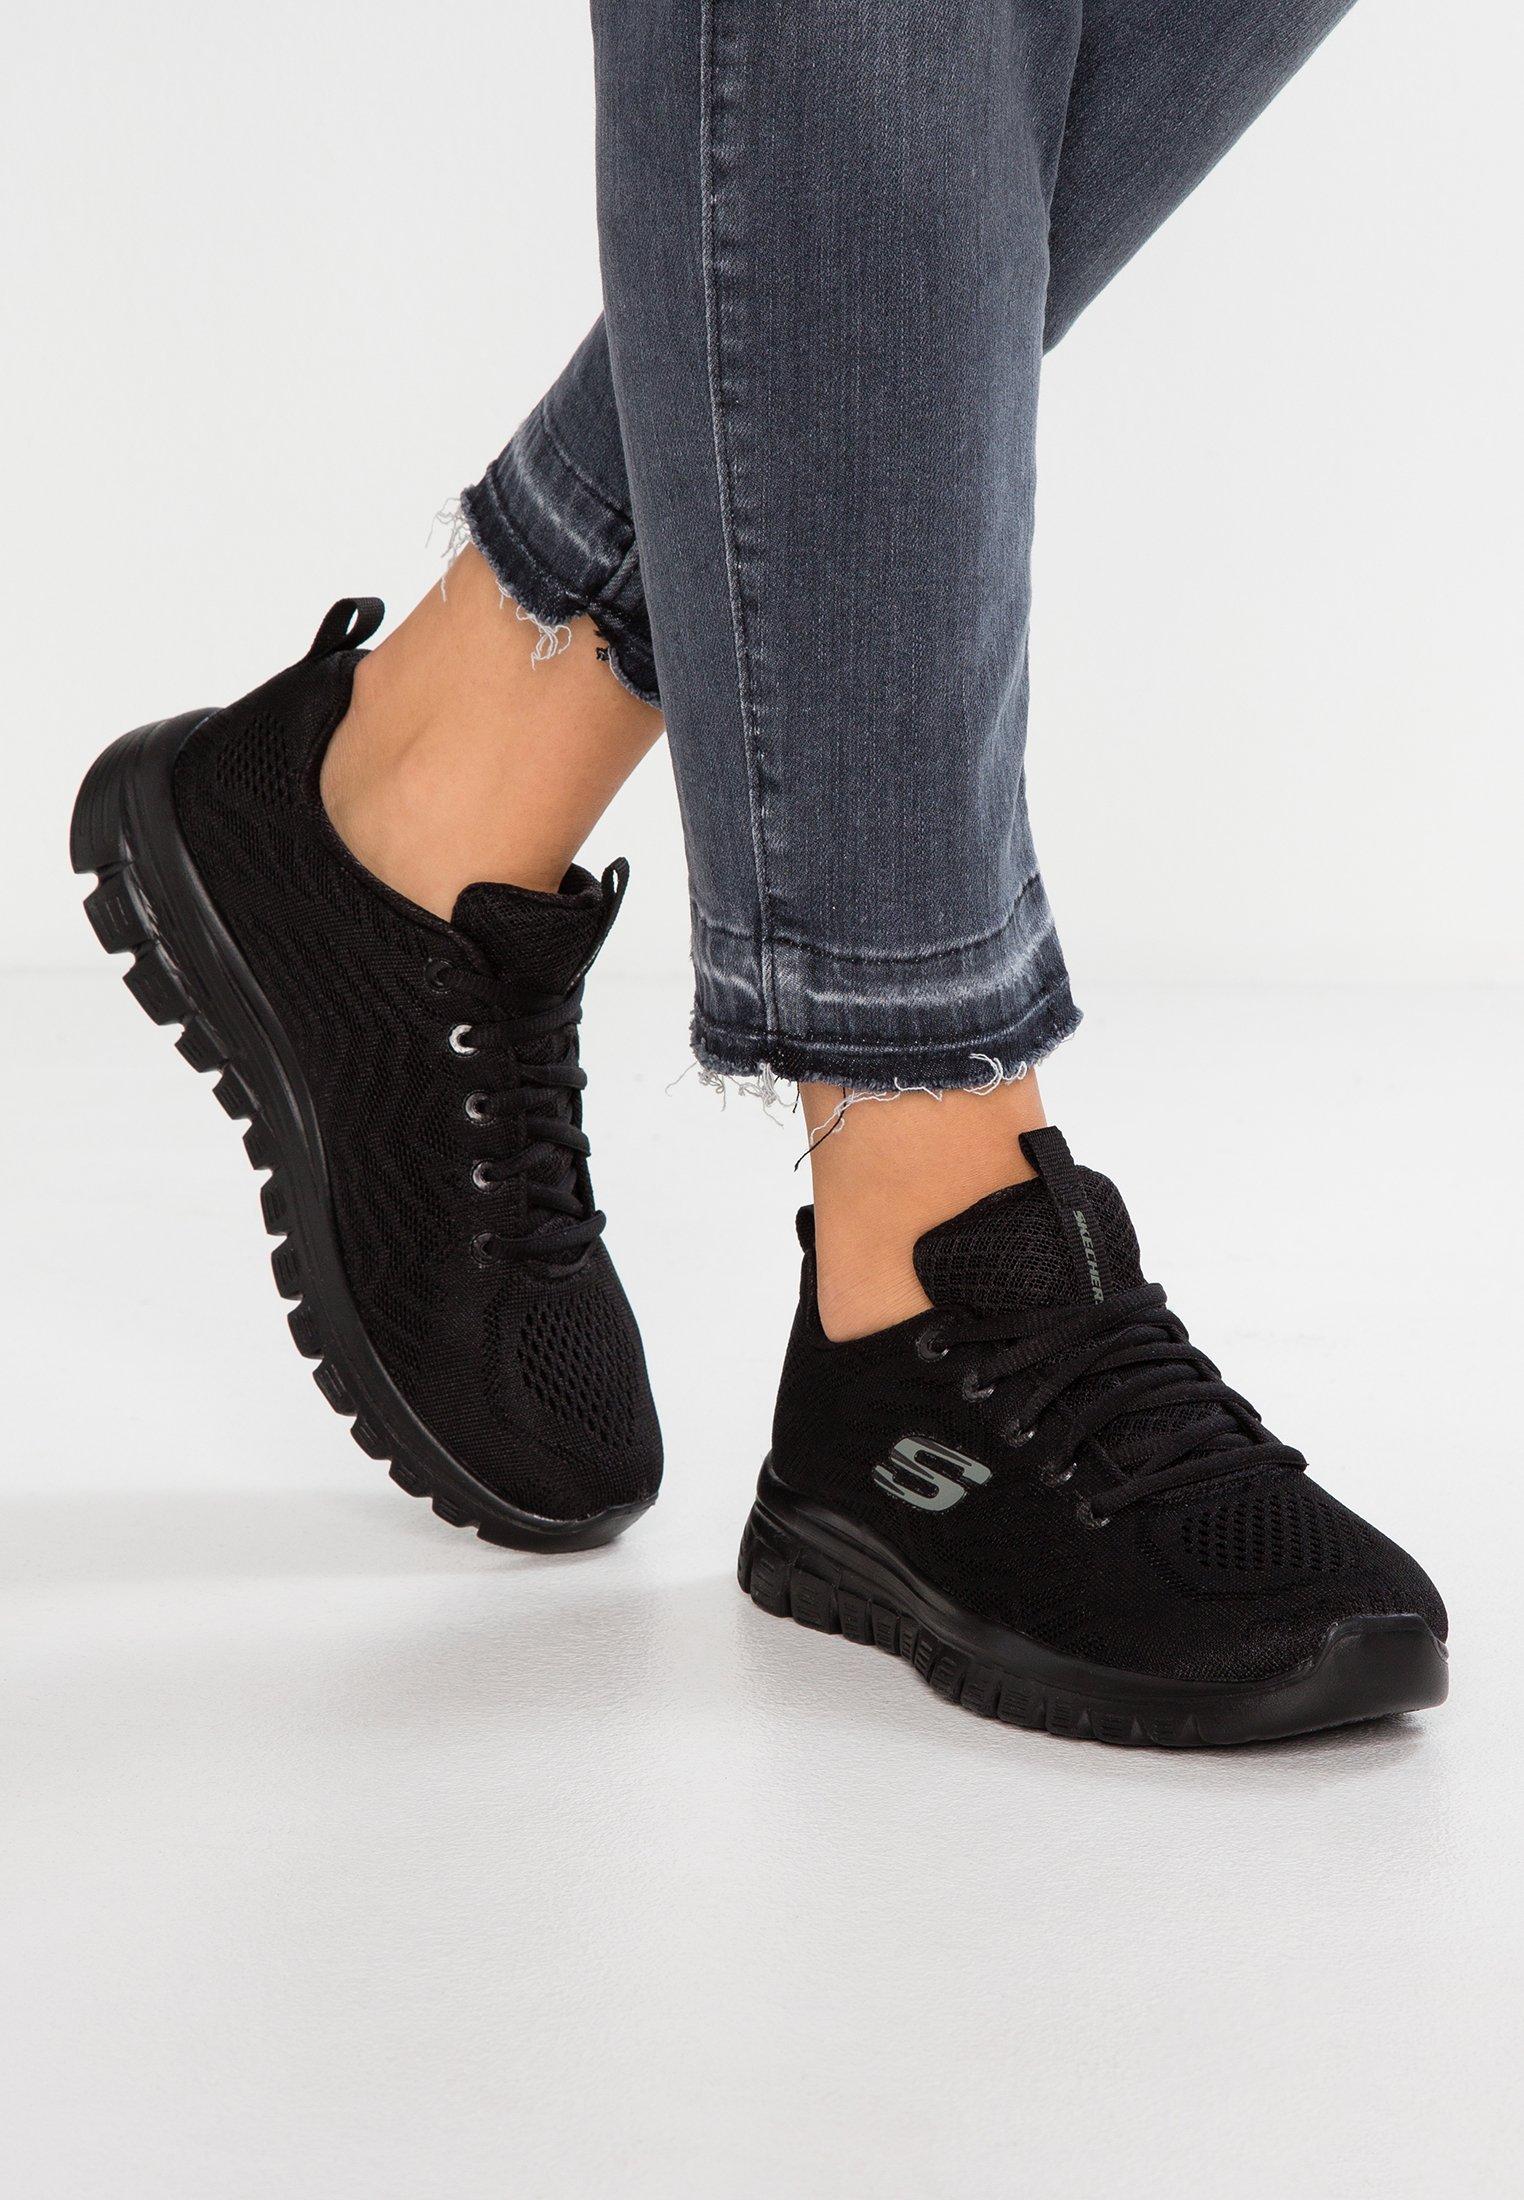 zapatos skechers 2018 negra deportivas